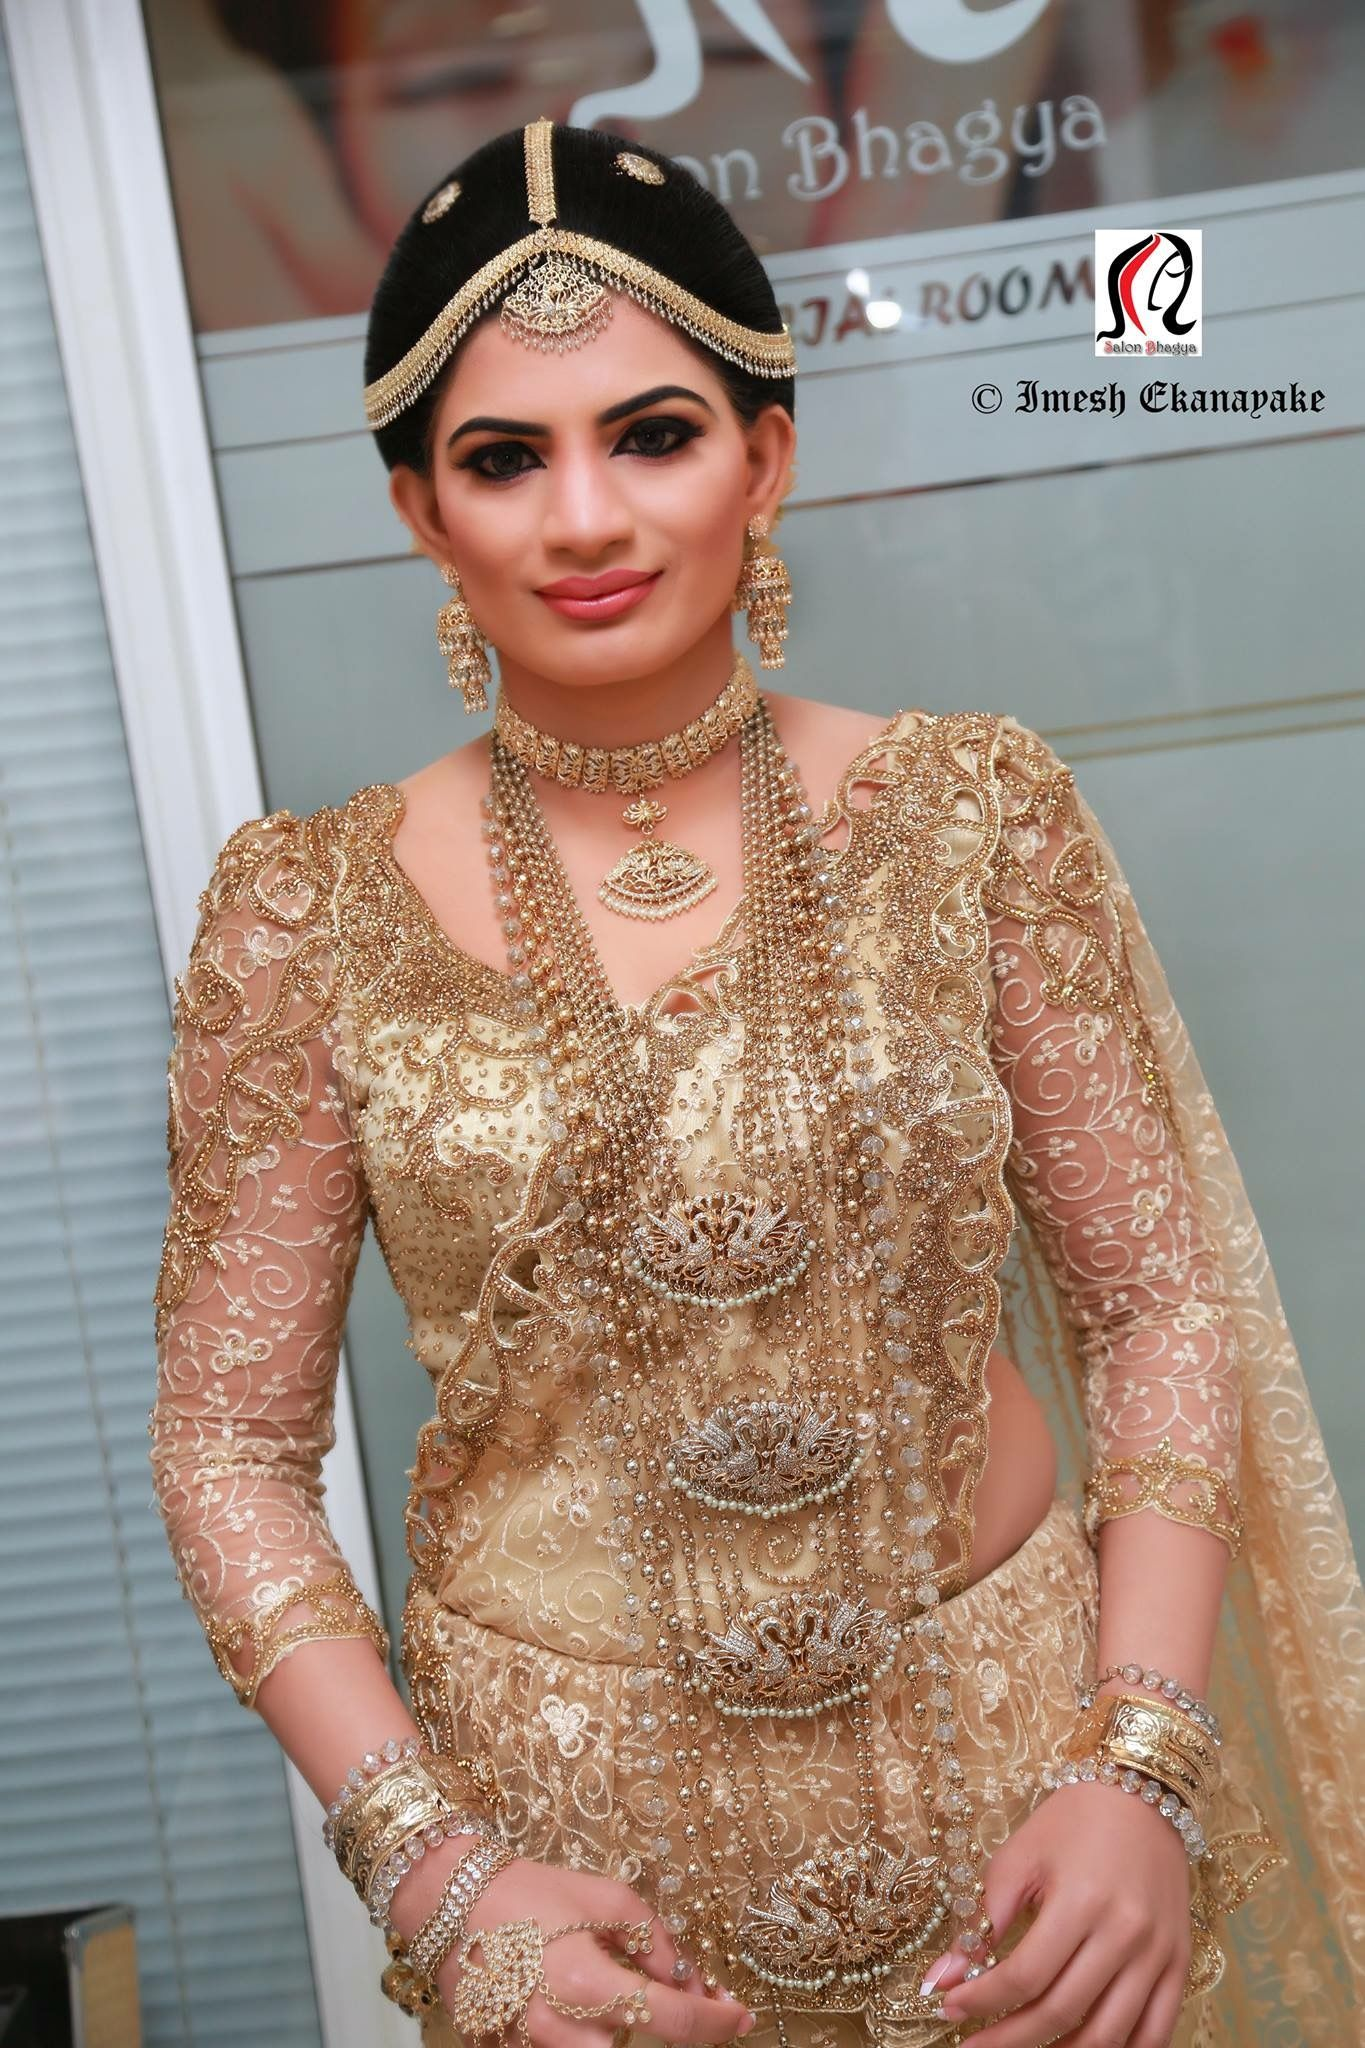 Pin by Wedding Sri Lanka on Kandyan Bridal Sri Lanka (With